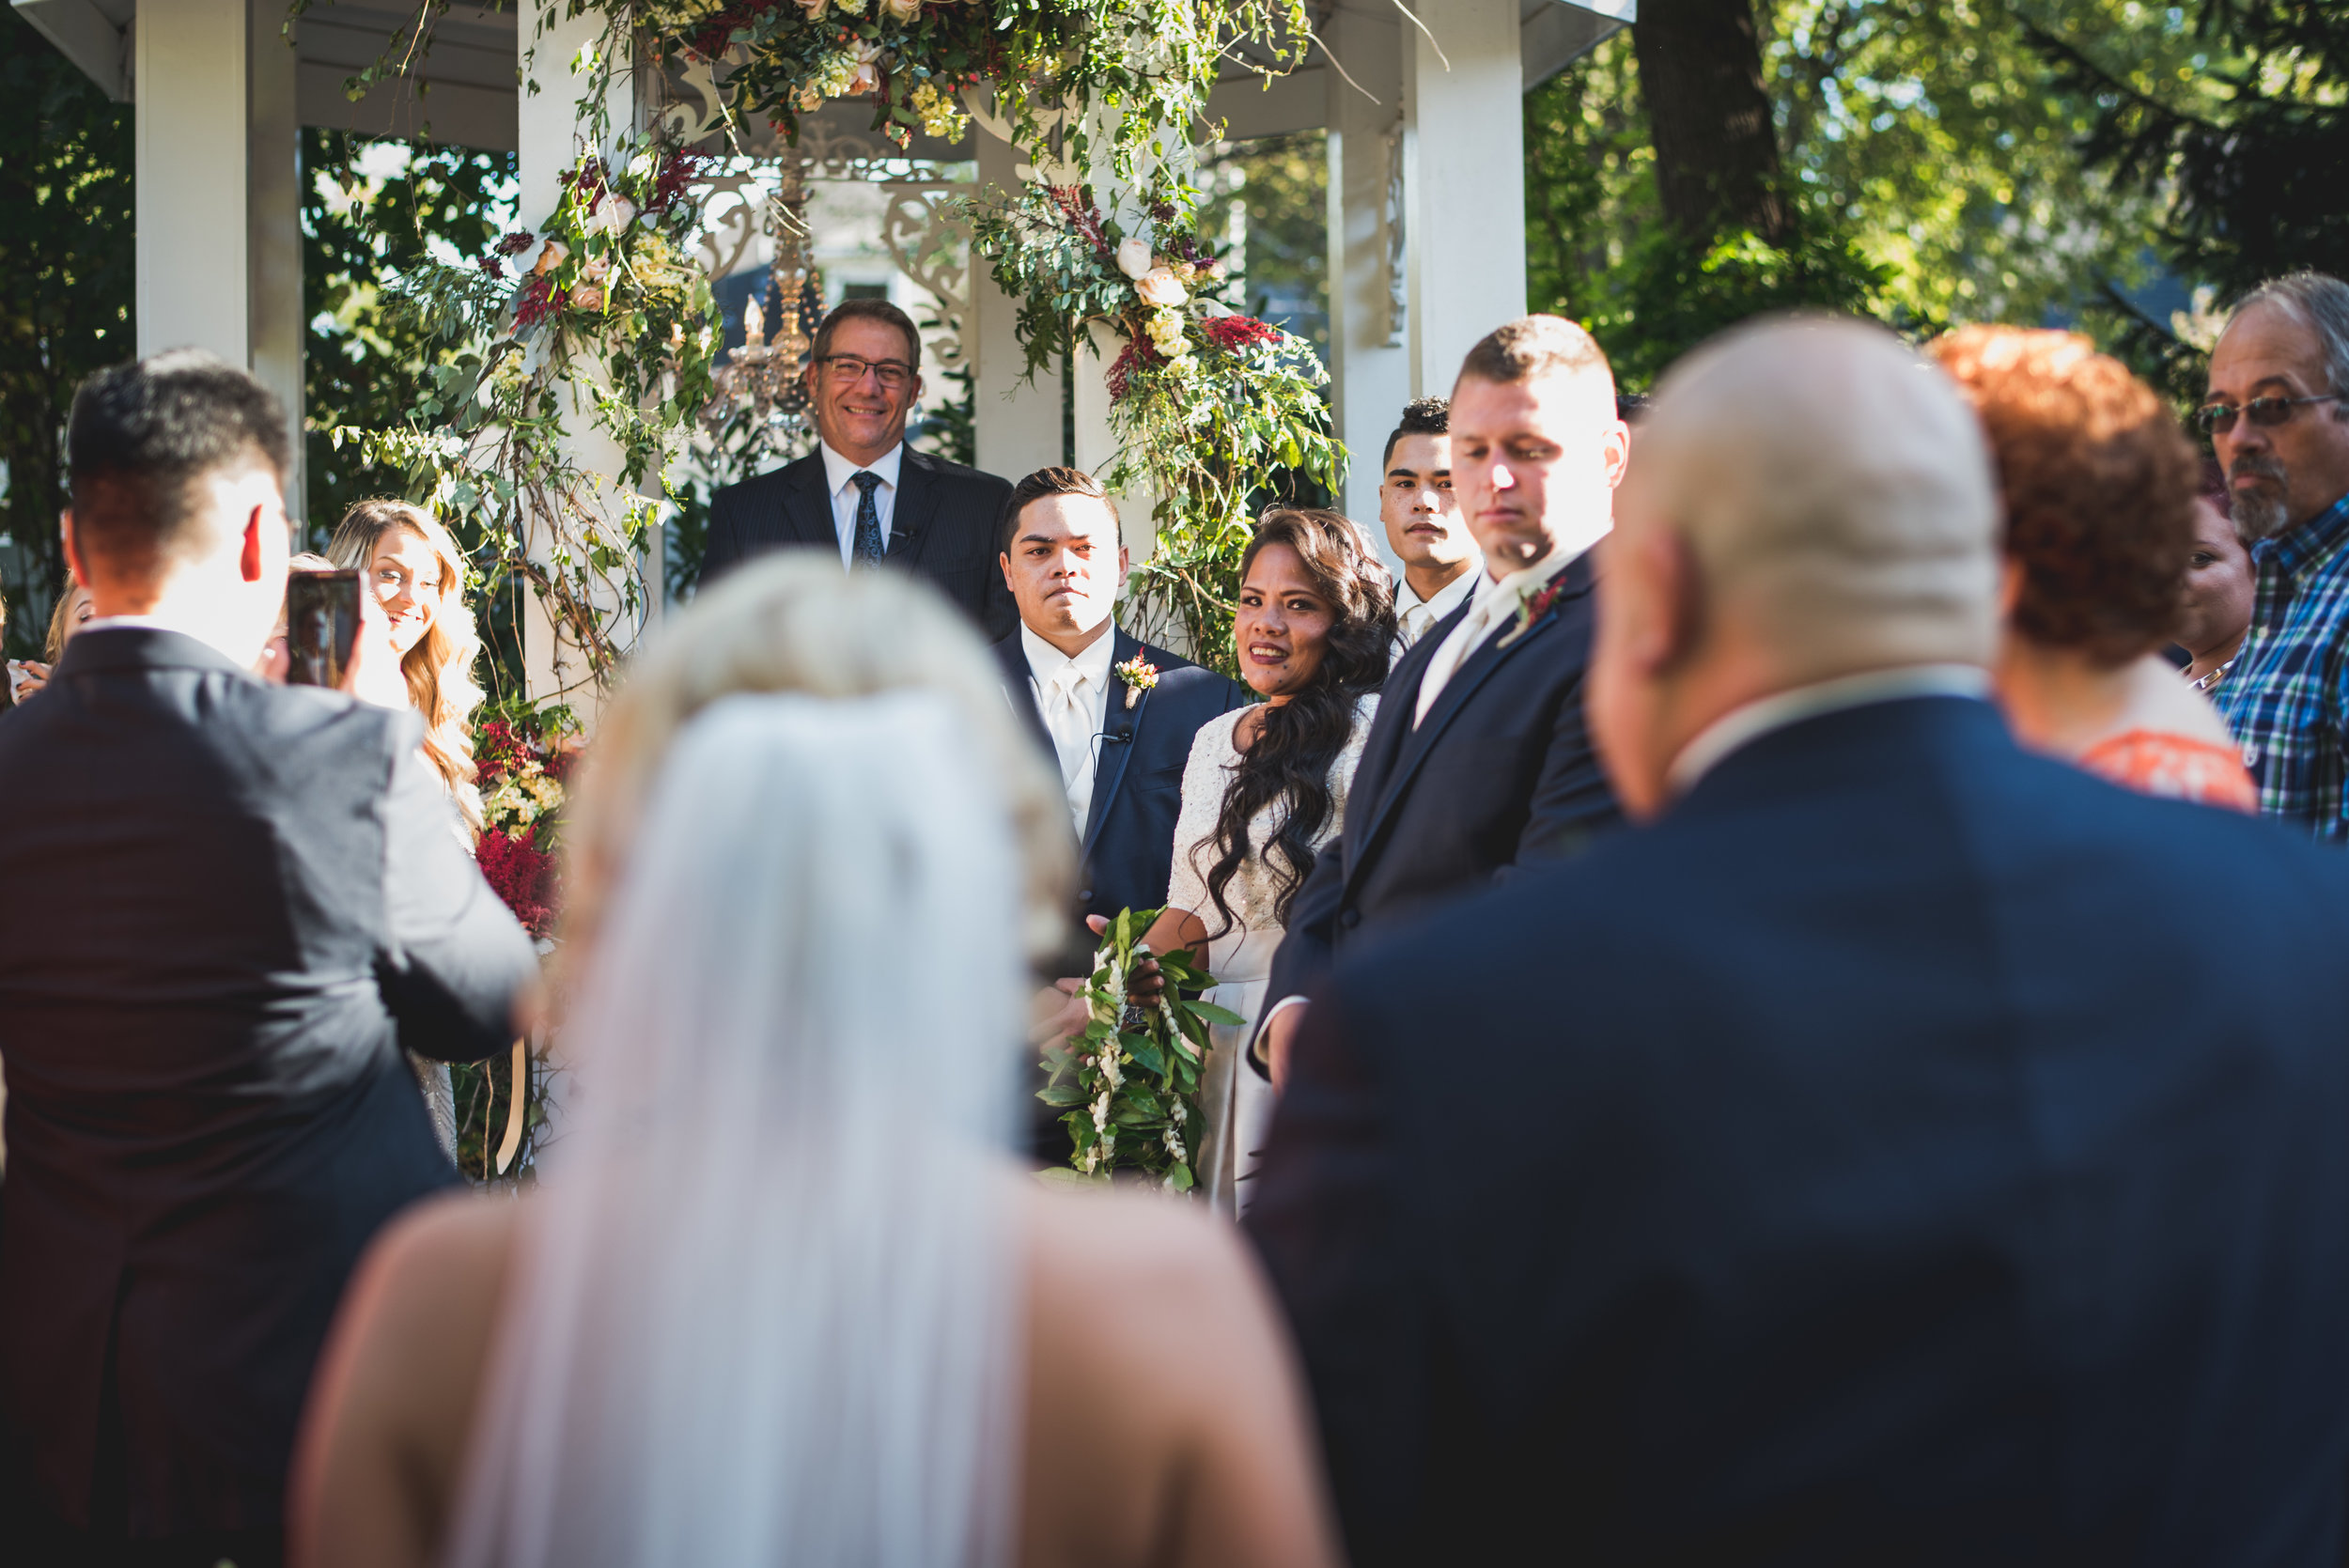 Nashville-wedding-photographers-CJ's-Off-The-Square-27.JPG